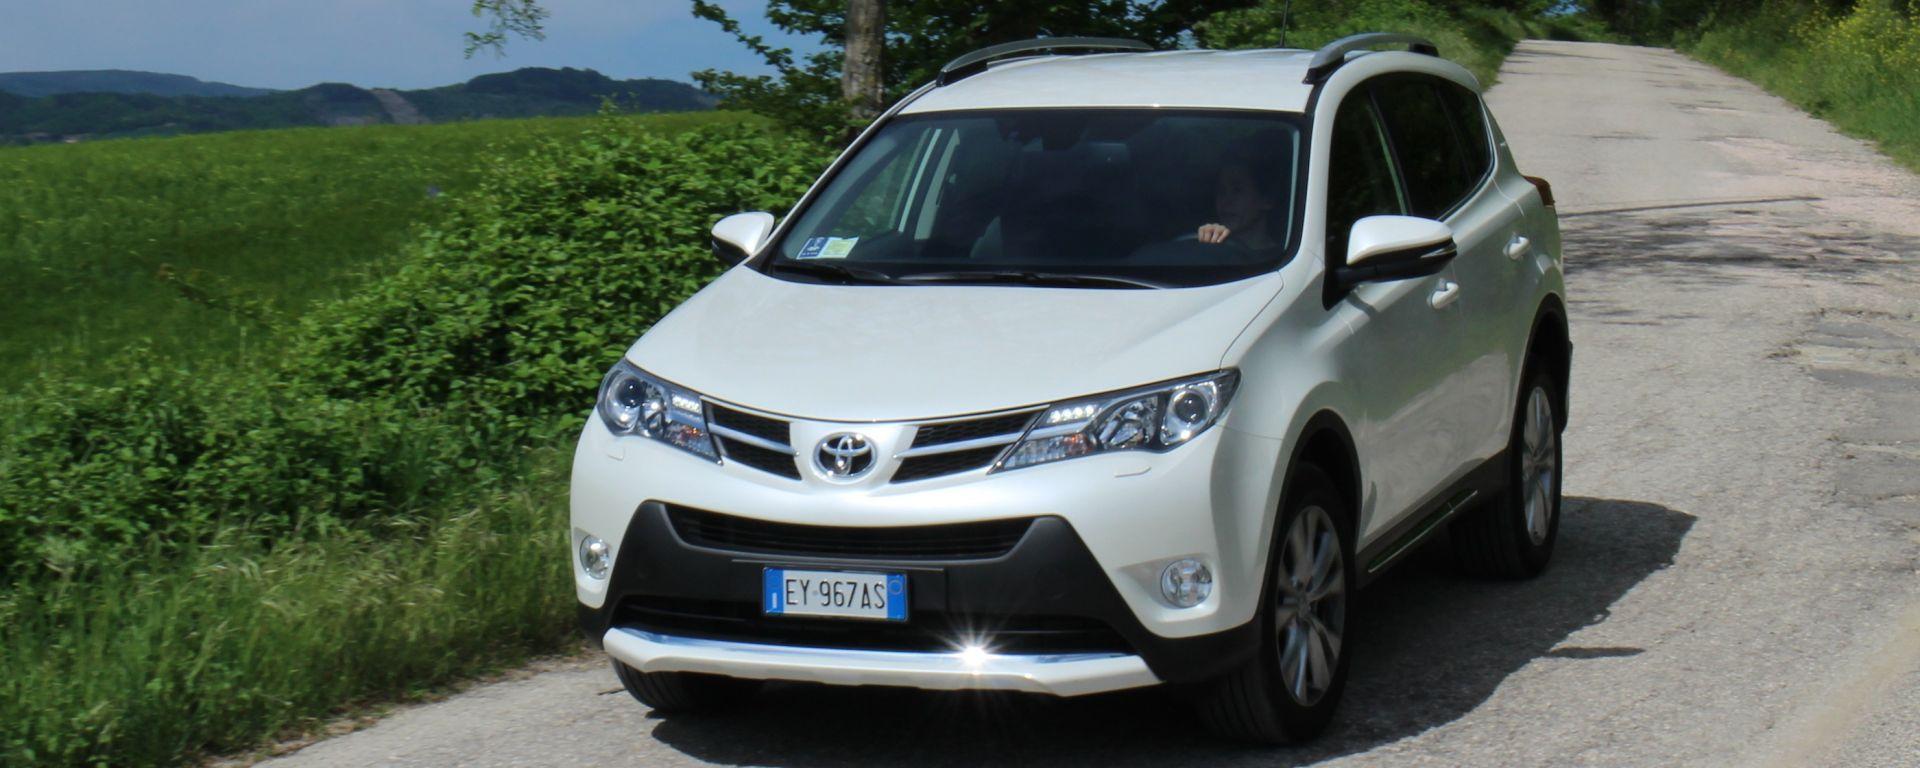 Toyota RAV4 2.0 D-4D Lounge White Edition